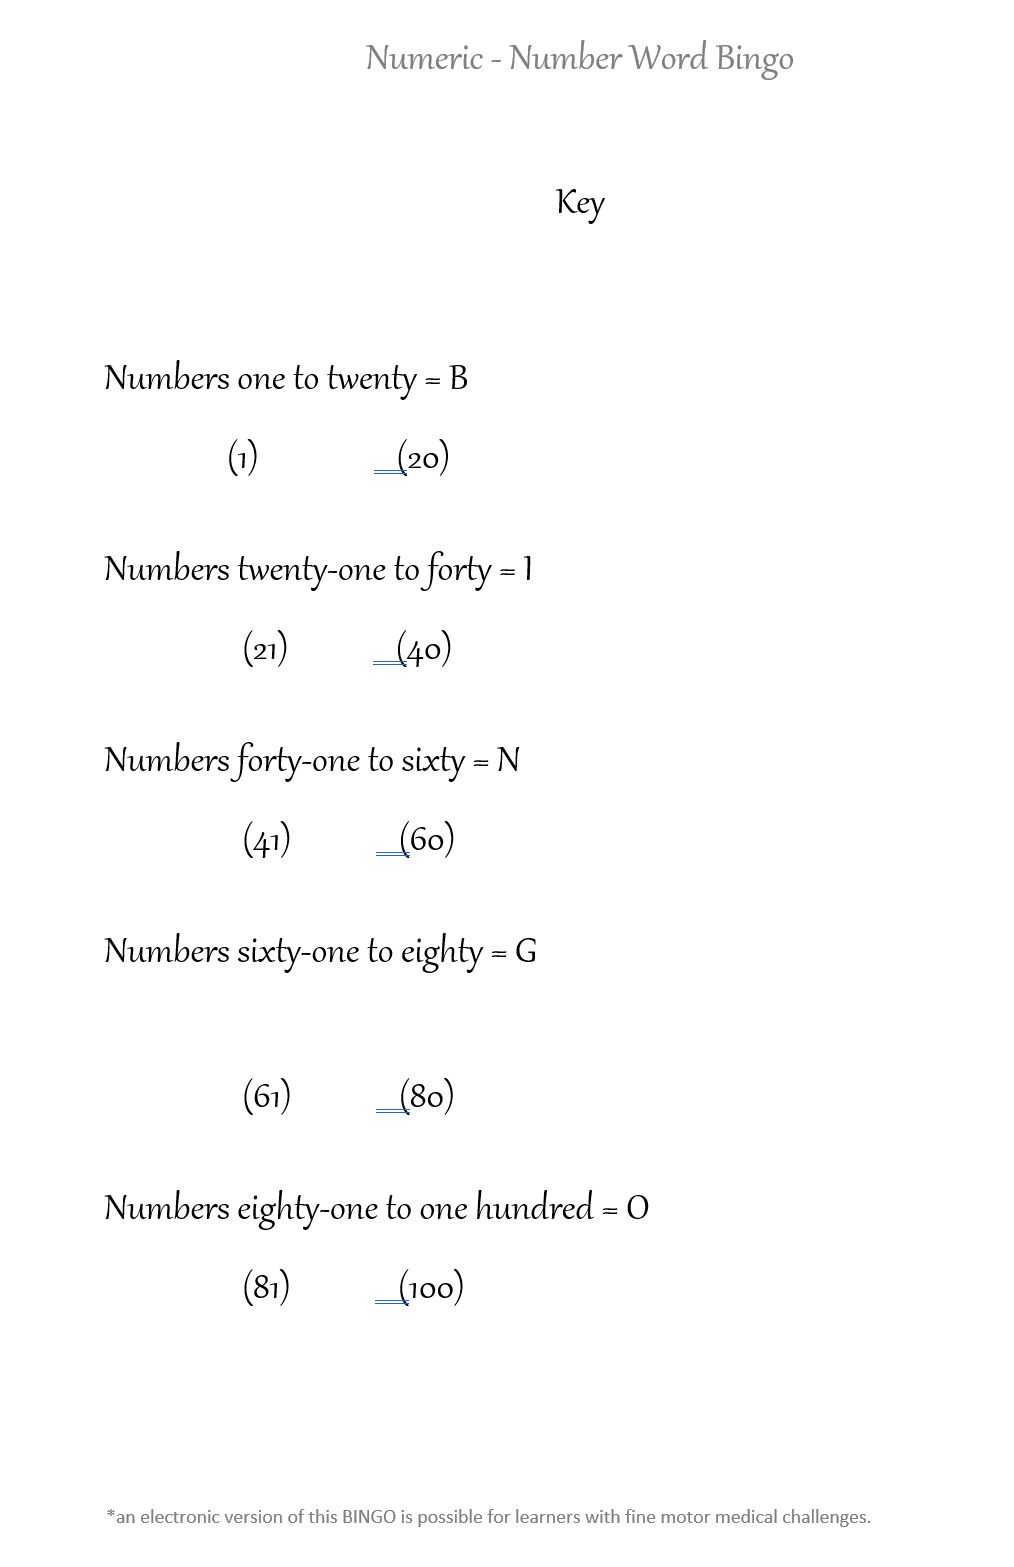 number word bingo pg5 of 5